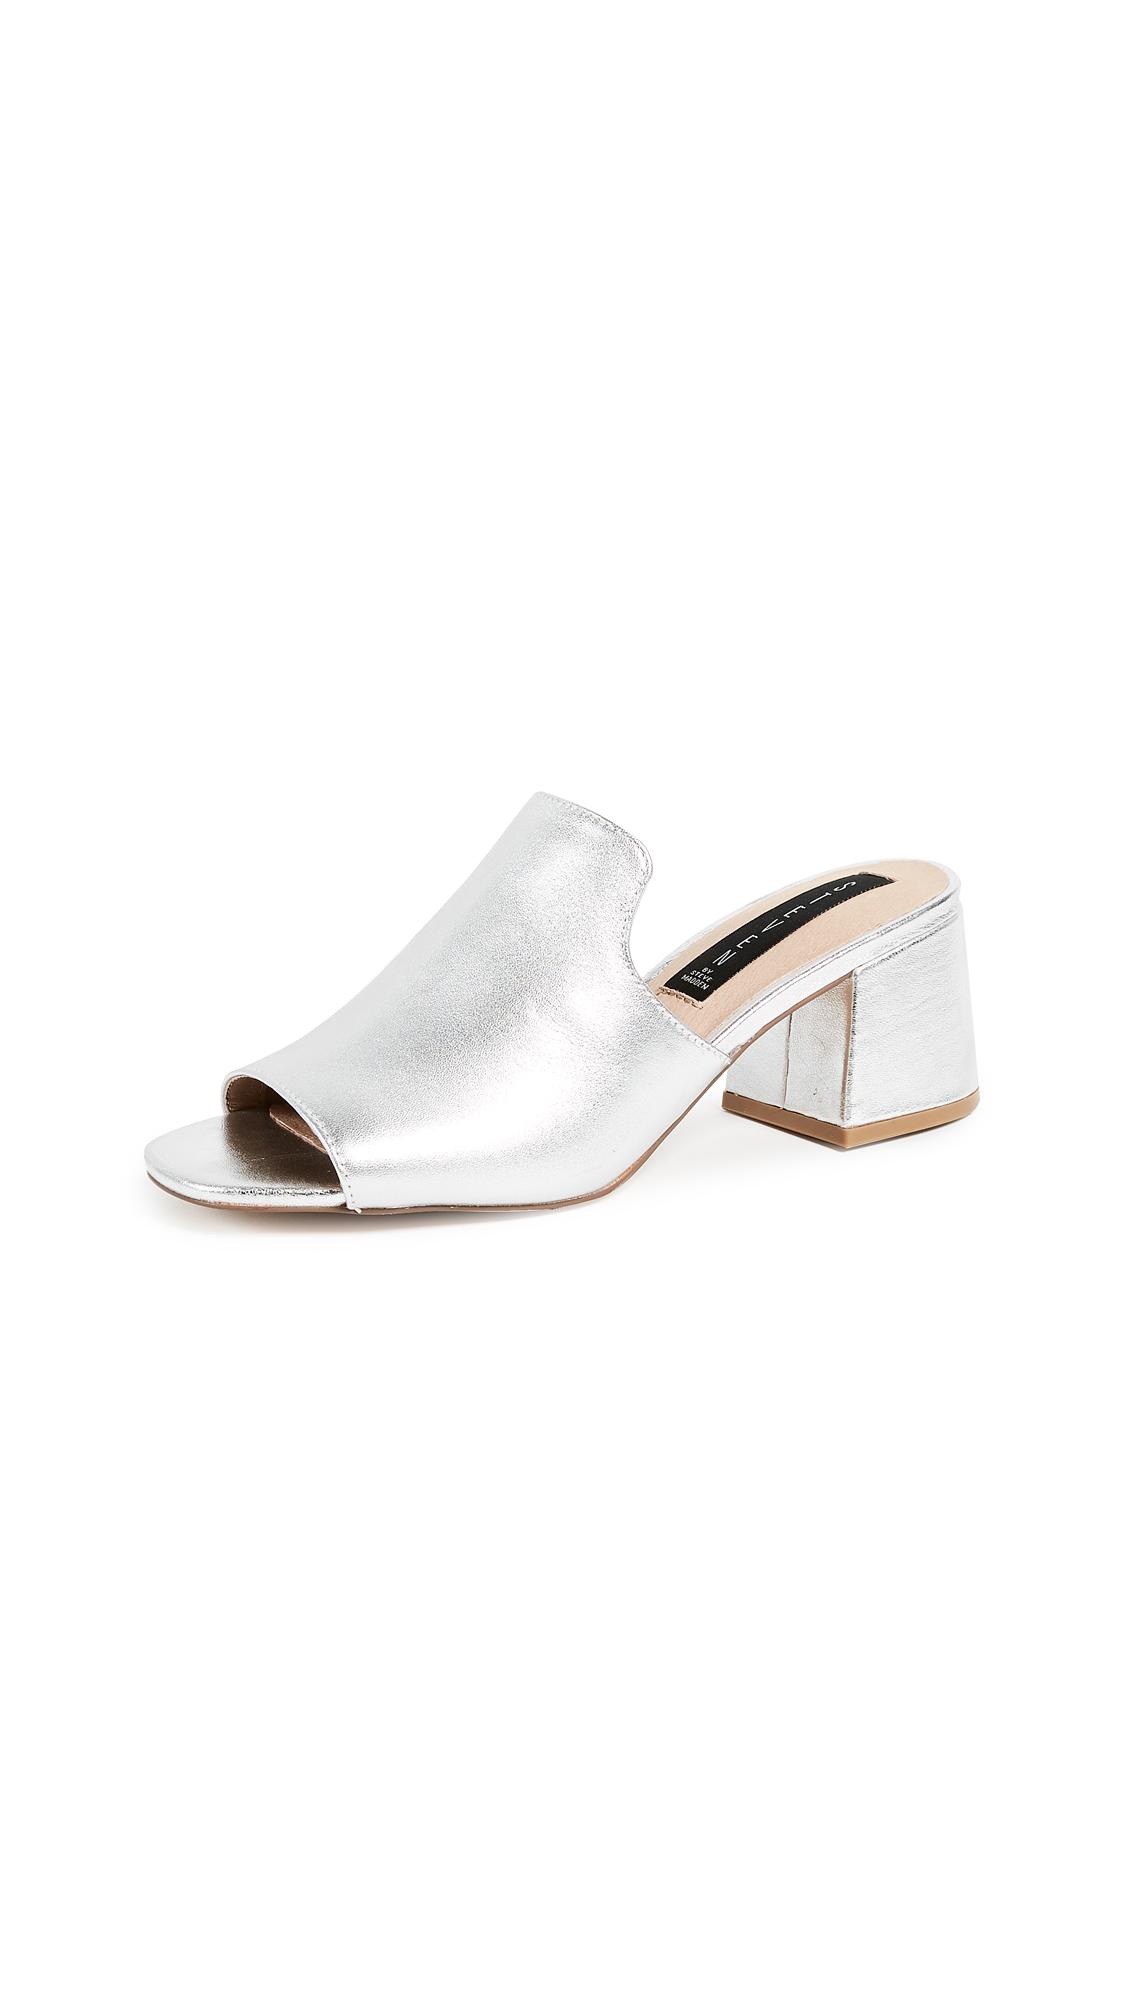 Steven Waze Block Heel Sandals - Silver